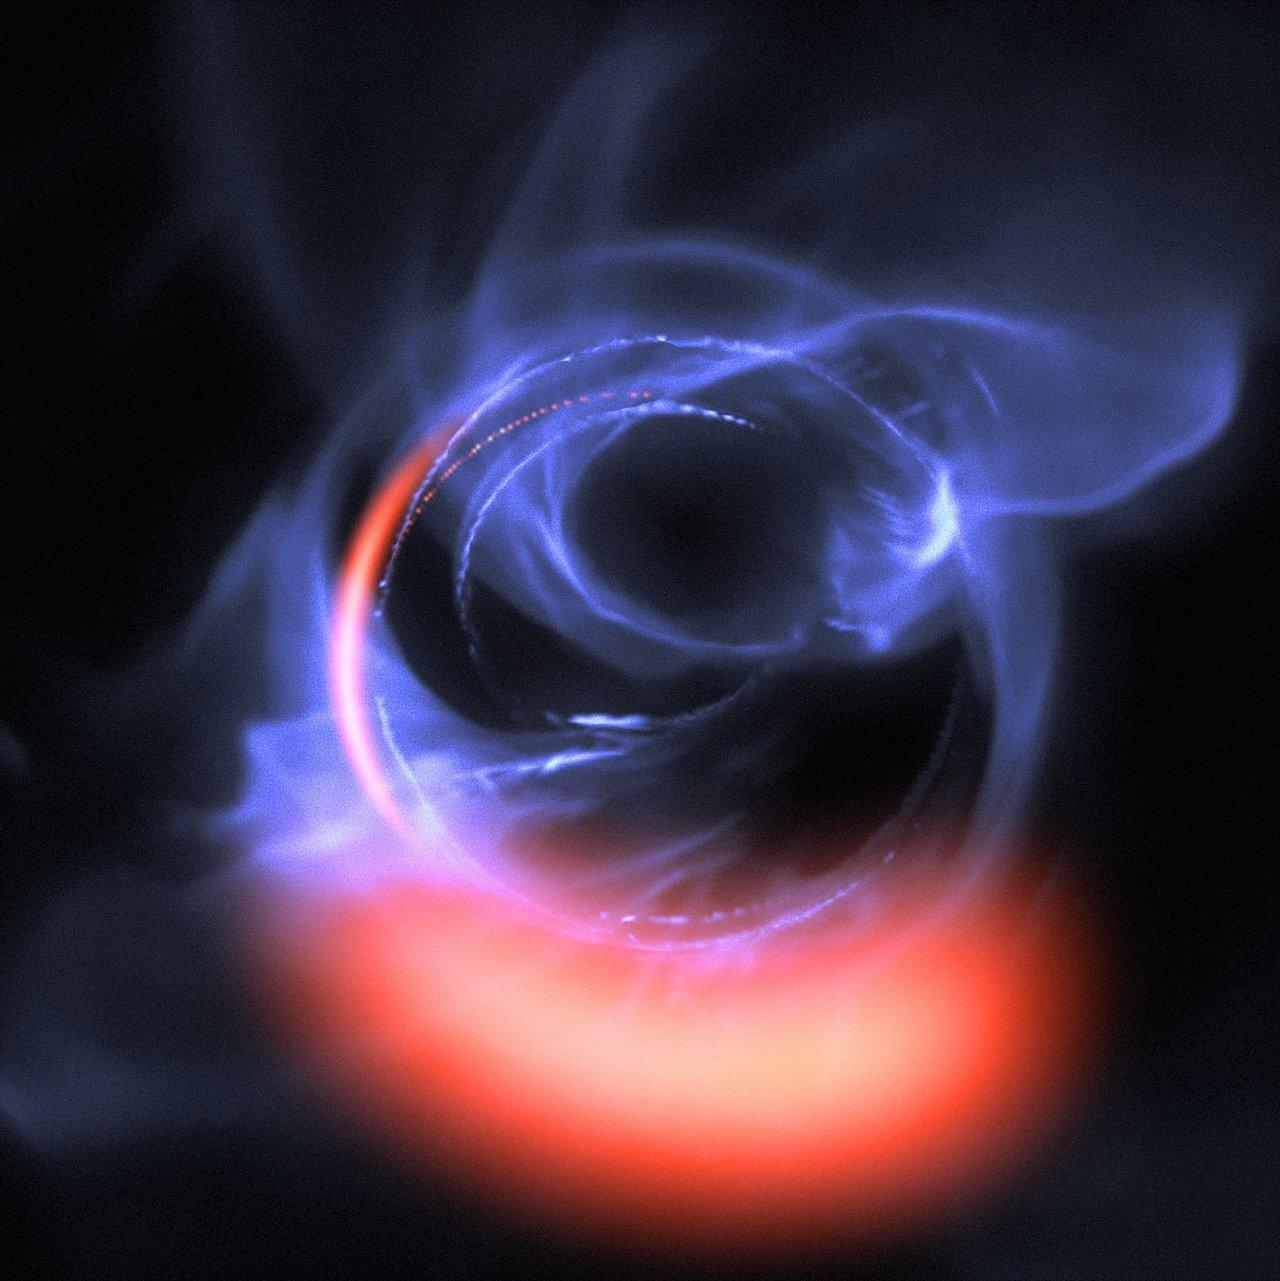 Black hole feeding on gaseous material